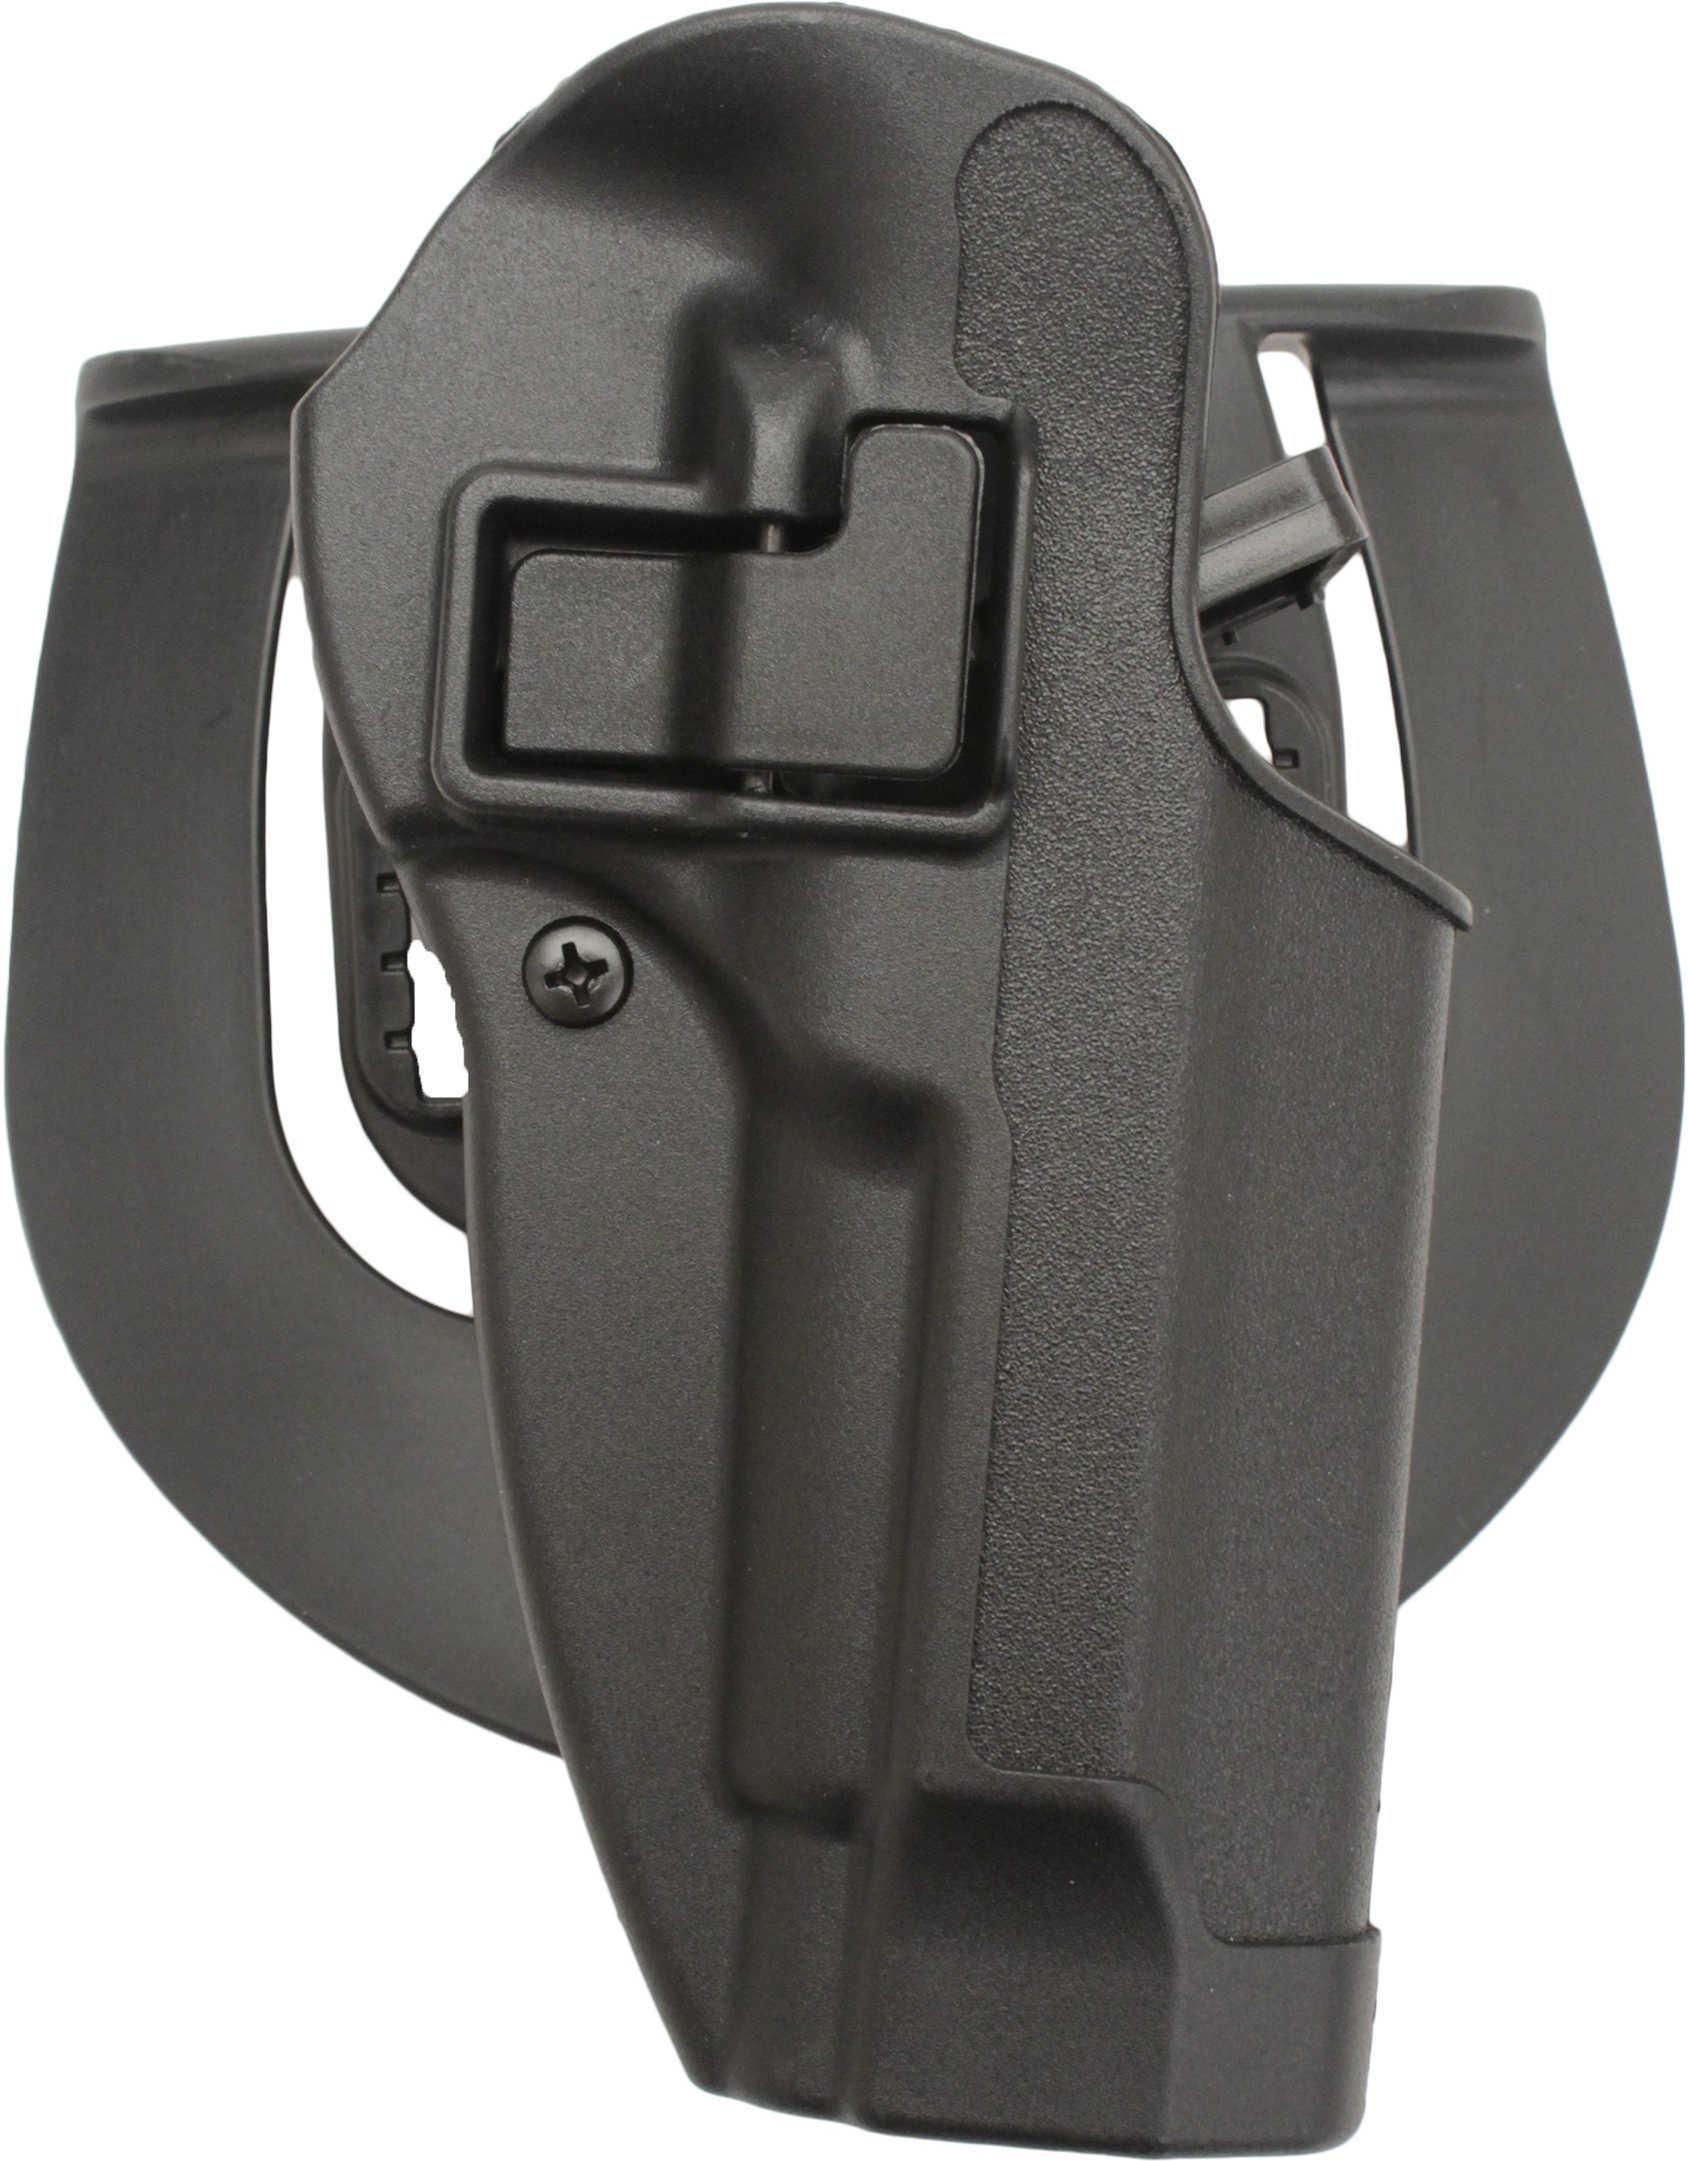 Blackhawk Carbon Fiber Serpa Belt & Paddle Holster Beretta 92/96, Right Hand Md: 410504Bk-R